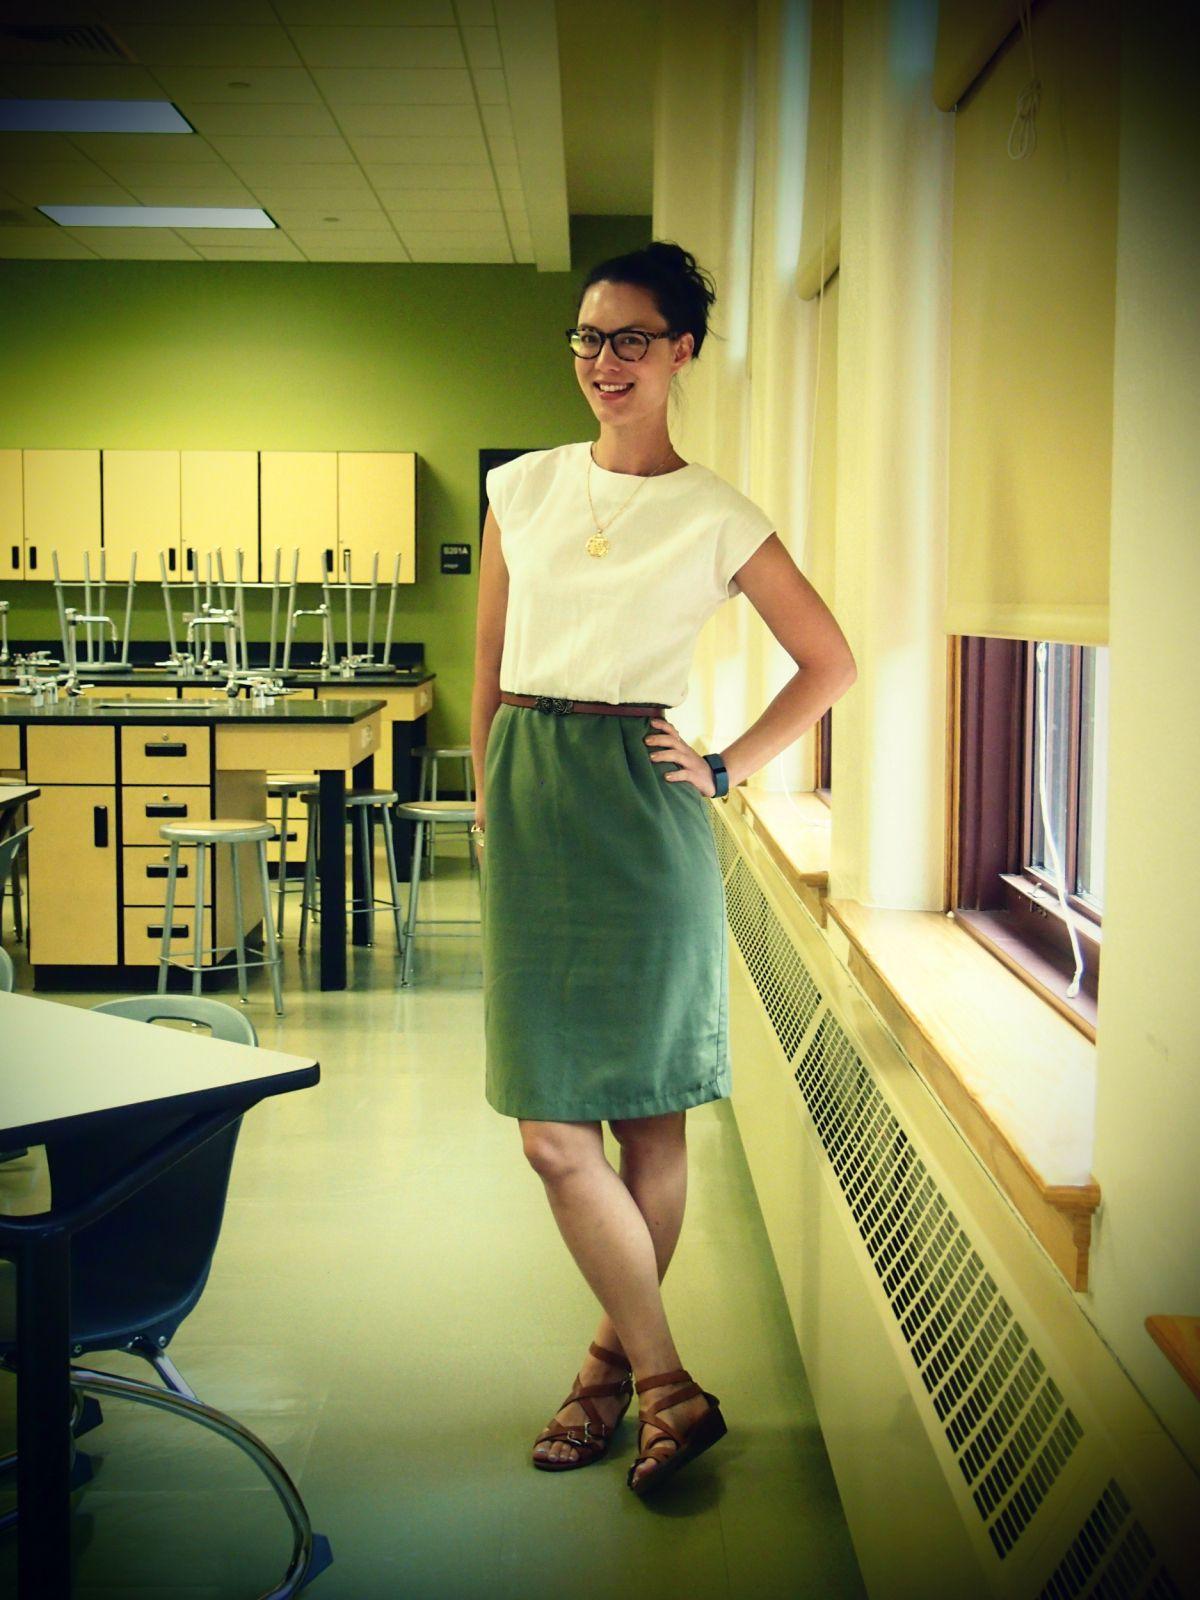 A Little Bit of WoWe : Teacher Style: Black Chiffon Dress